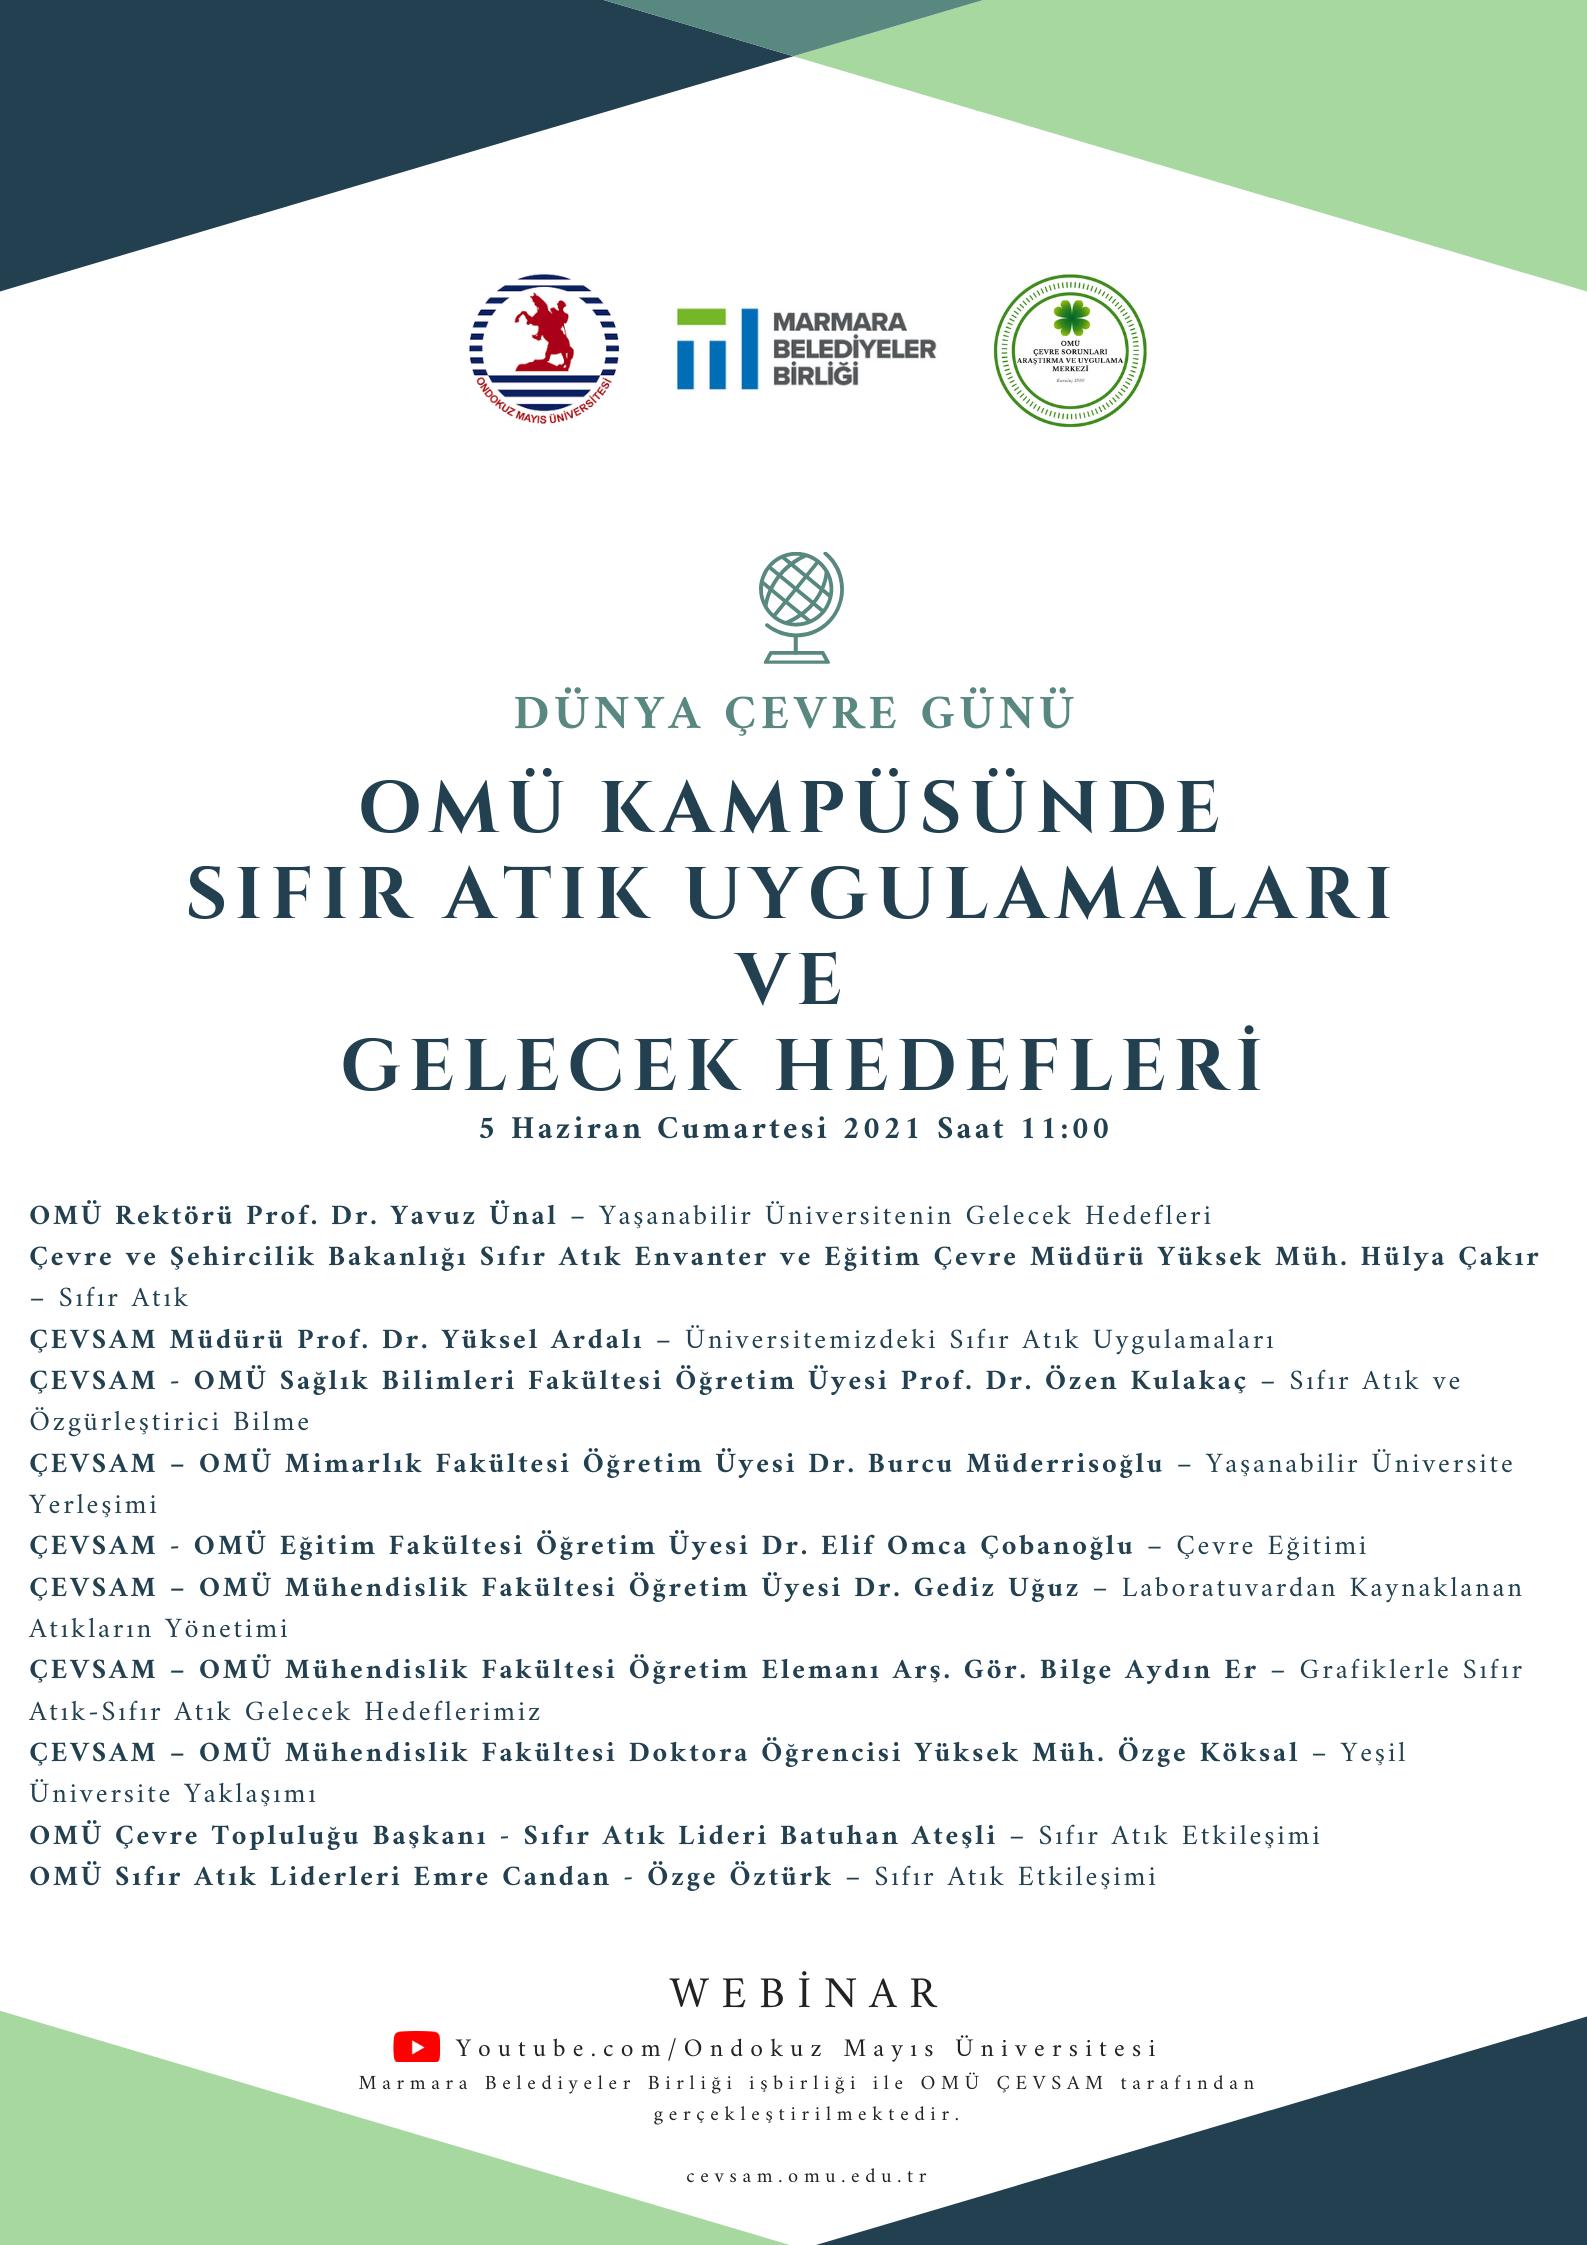 https://www.omu.edu.tr/sites/default/files/5_haziran_2021_faaliyeti.png